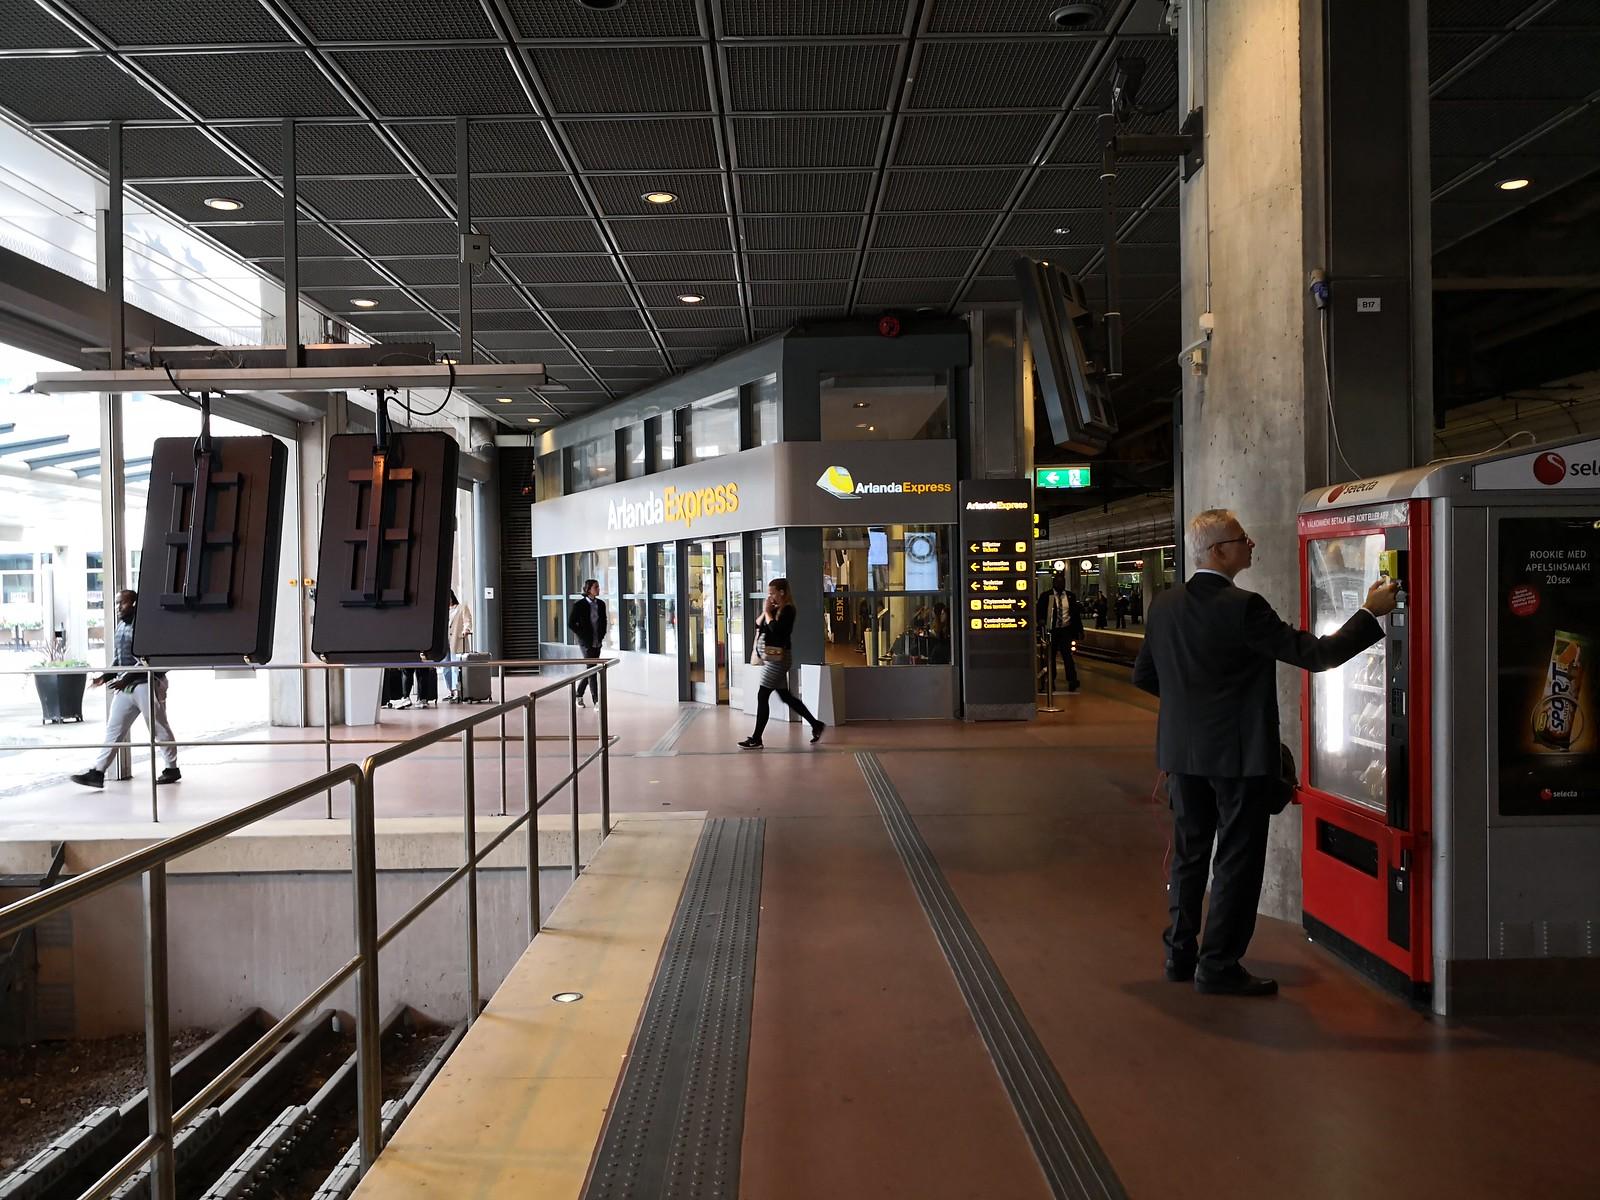 Arlanda Express station